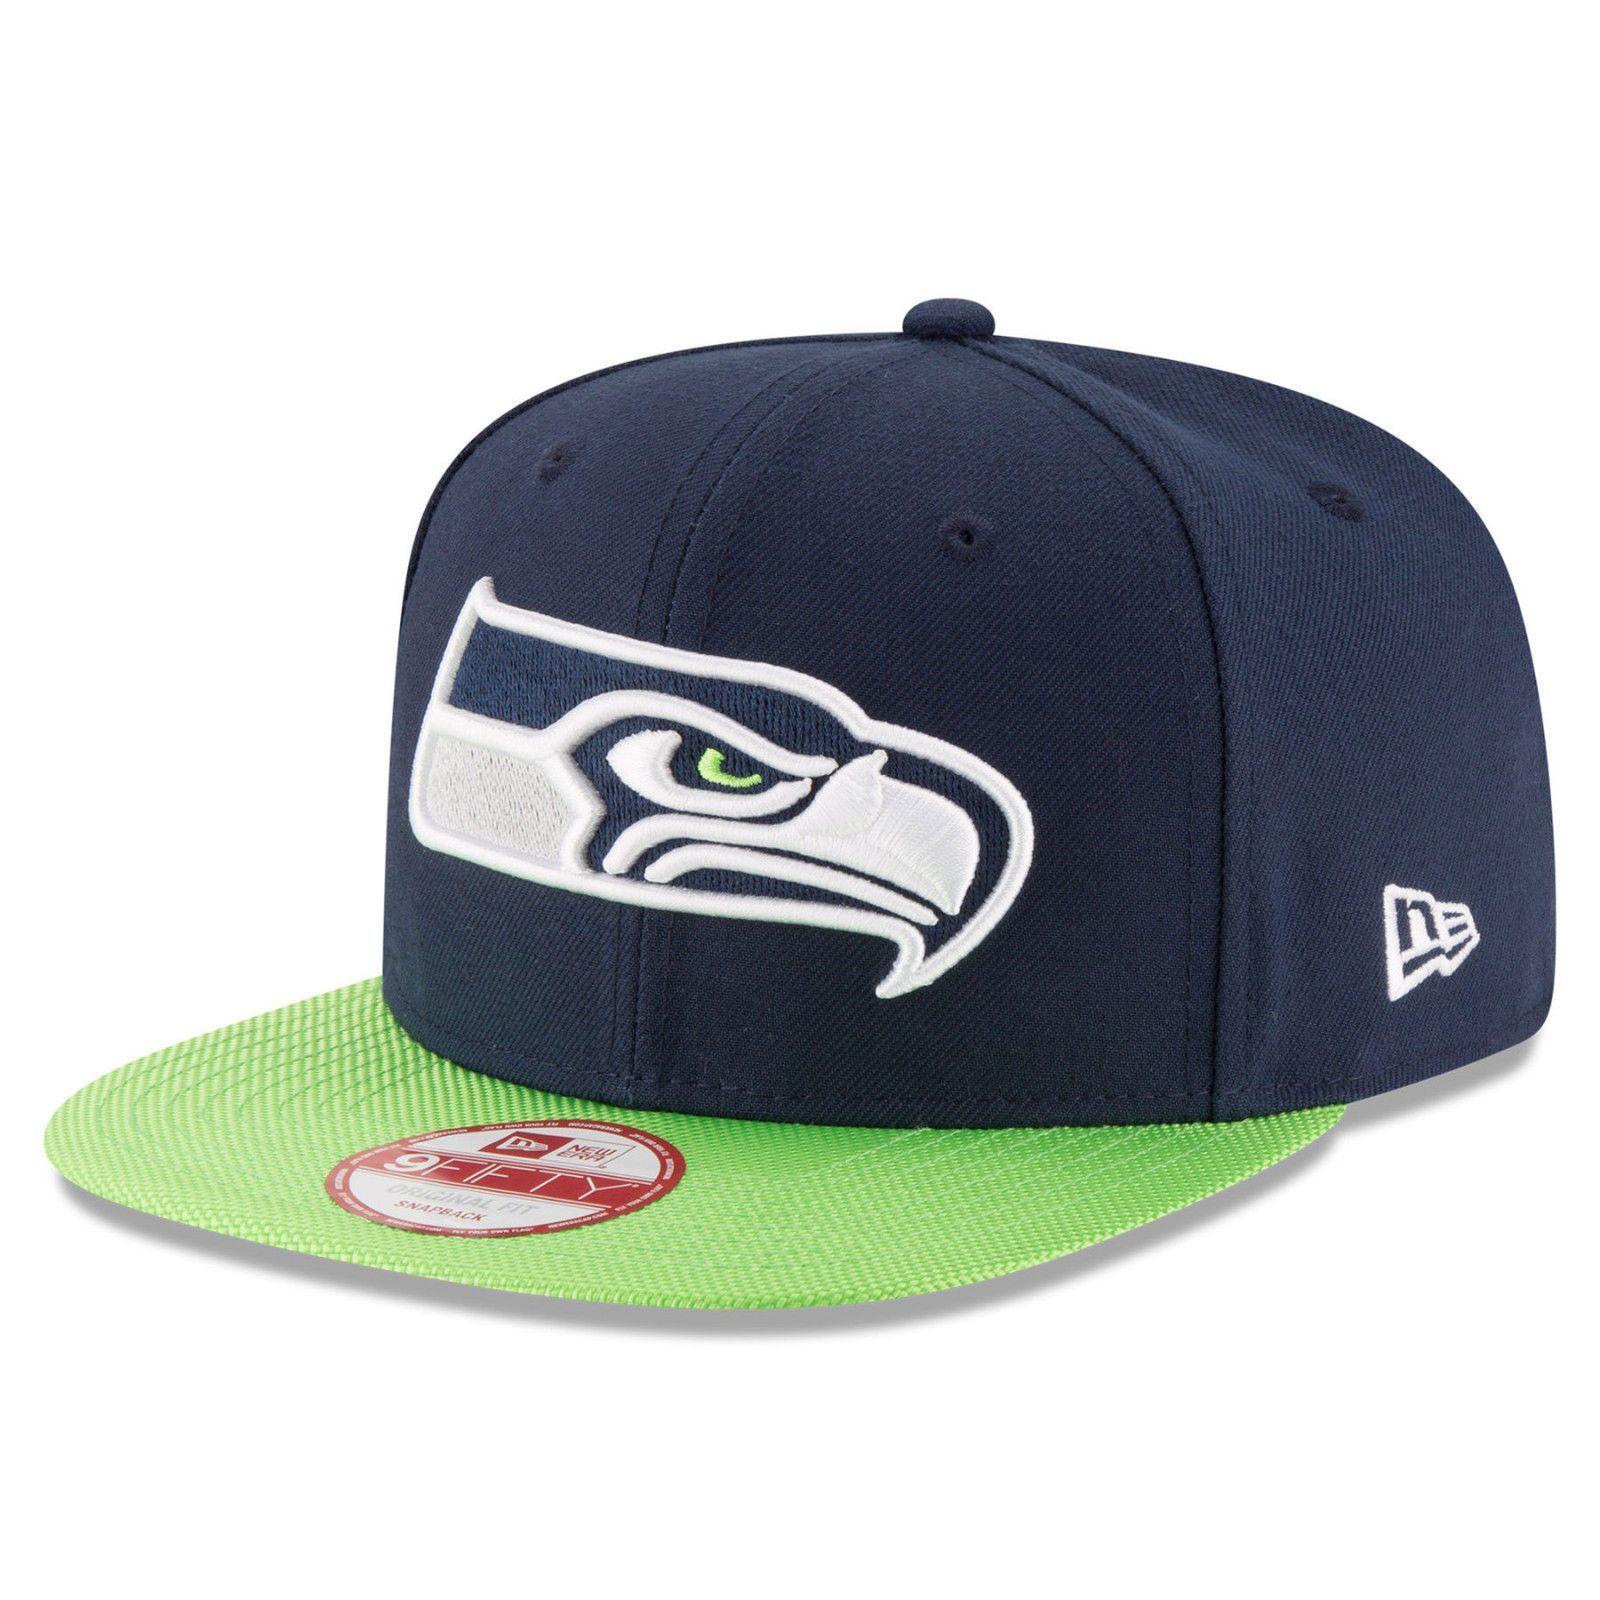 New Era Seattle Seahawks 9FIFTY Tricked Trim Snapback Cap